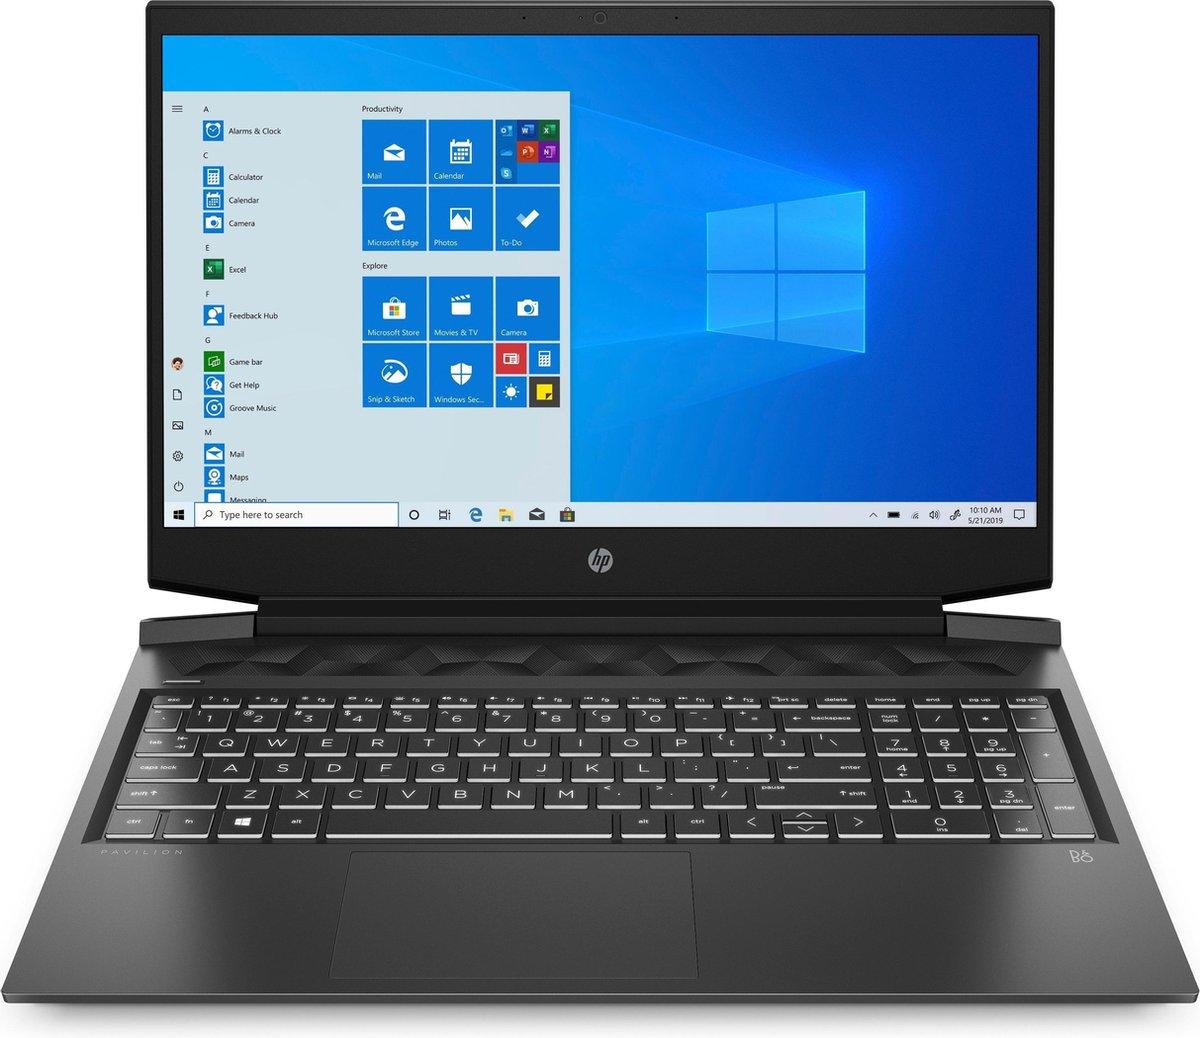 "HP Pavilion Gaming 16-a0174nd DDR4-SDRAM Notebook 40,9 cm (16.1"") 1920 x 1080 Pixels Intel® 10de generatie Core™ i7 16 GB 512 GB SSD NVIDIA GeForce GTX 1660 Ti Max-Q Wi-Fi 5 (802.11ac) Windows 10 Home Zwart, Chroom"